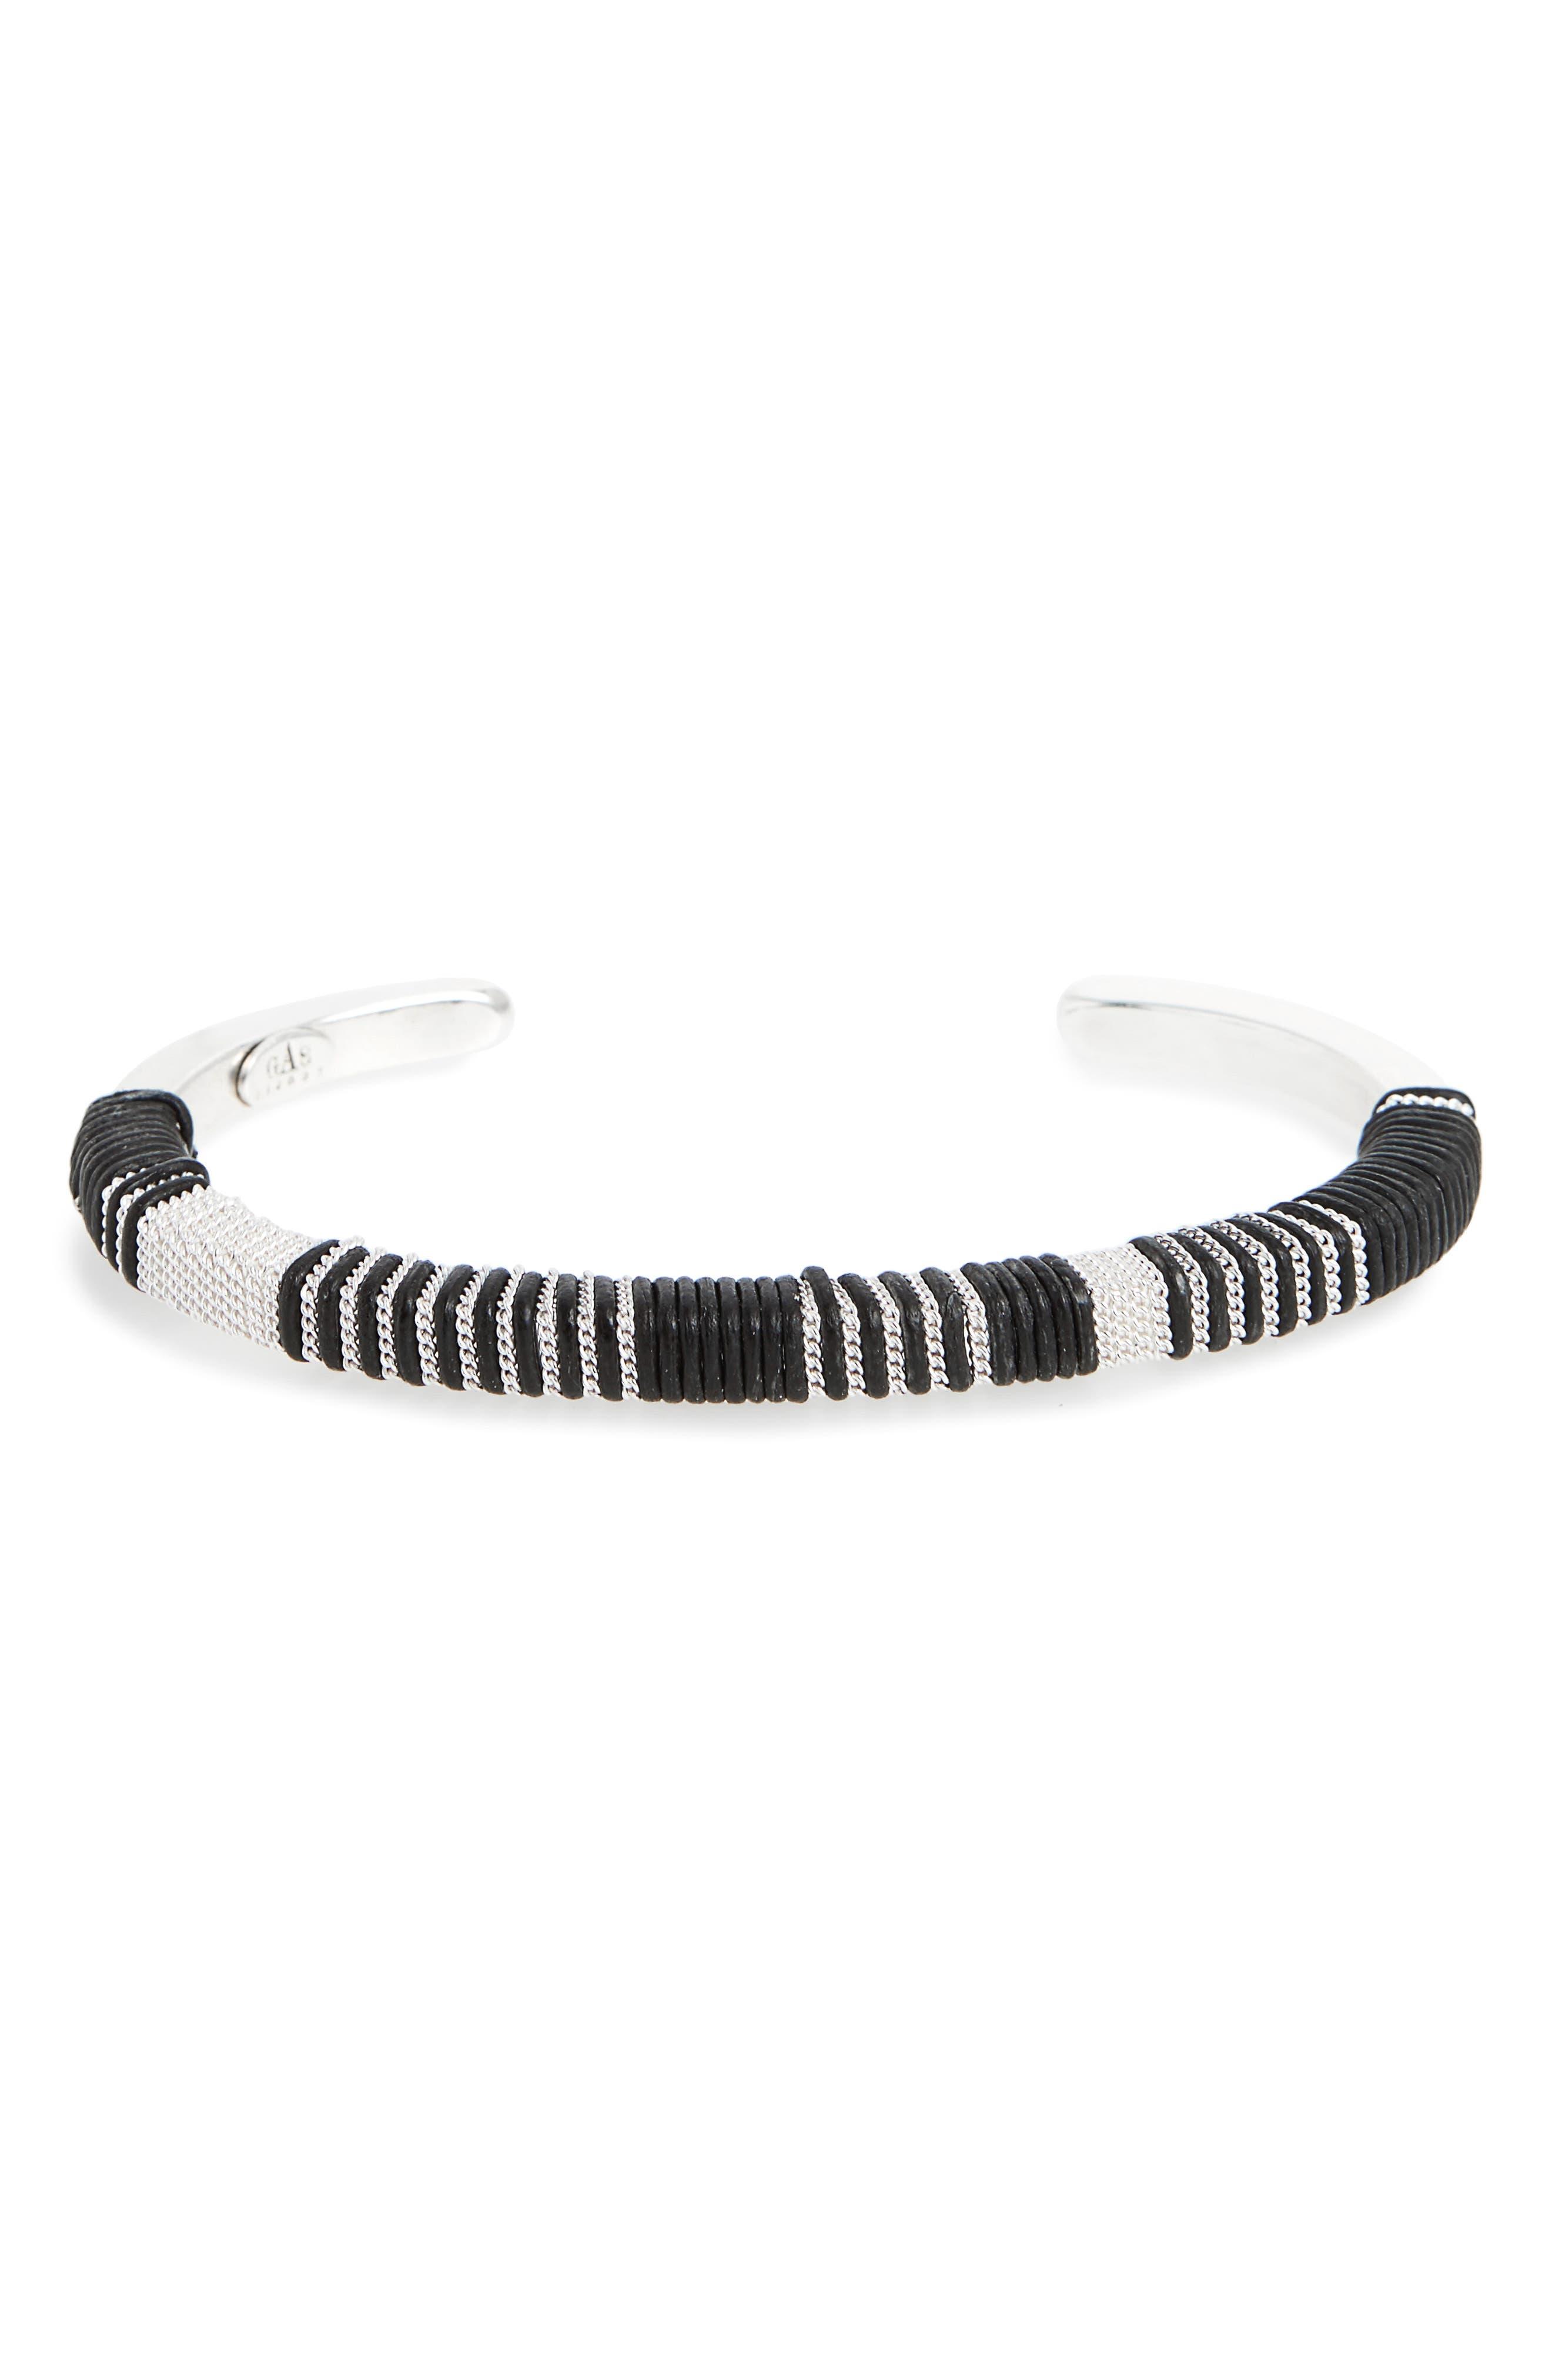 Tomboy Cuff Bracelet,                         Main,                         color, Black